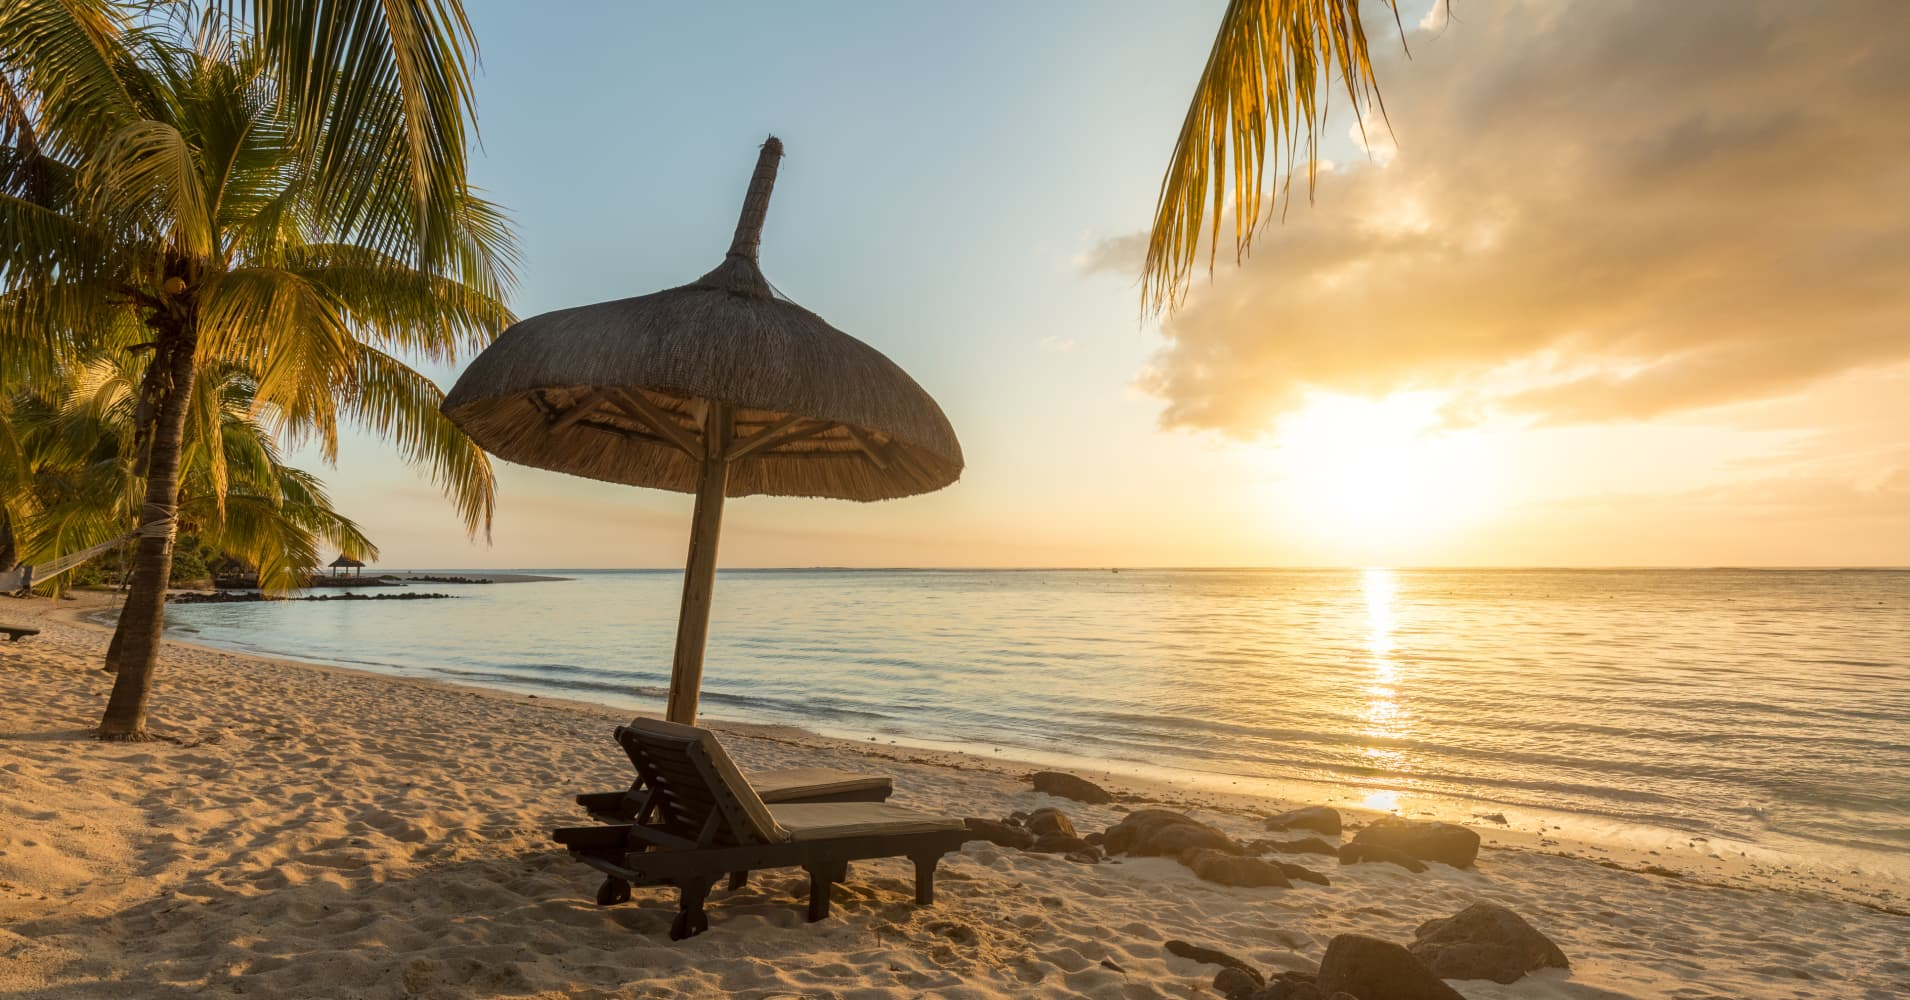 Paradisiac and Desert Island, white sand Beach, Palm tree at Sunset